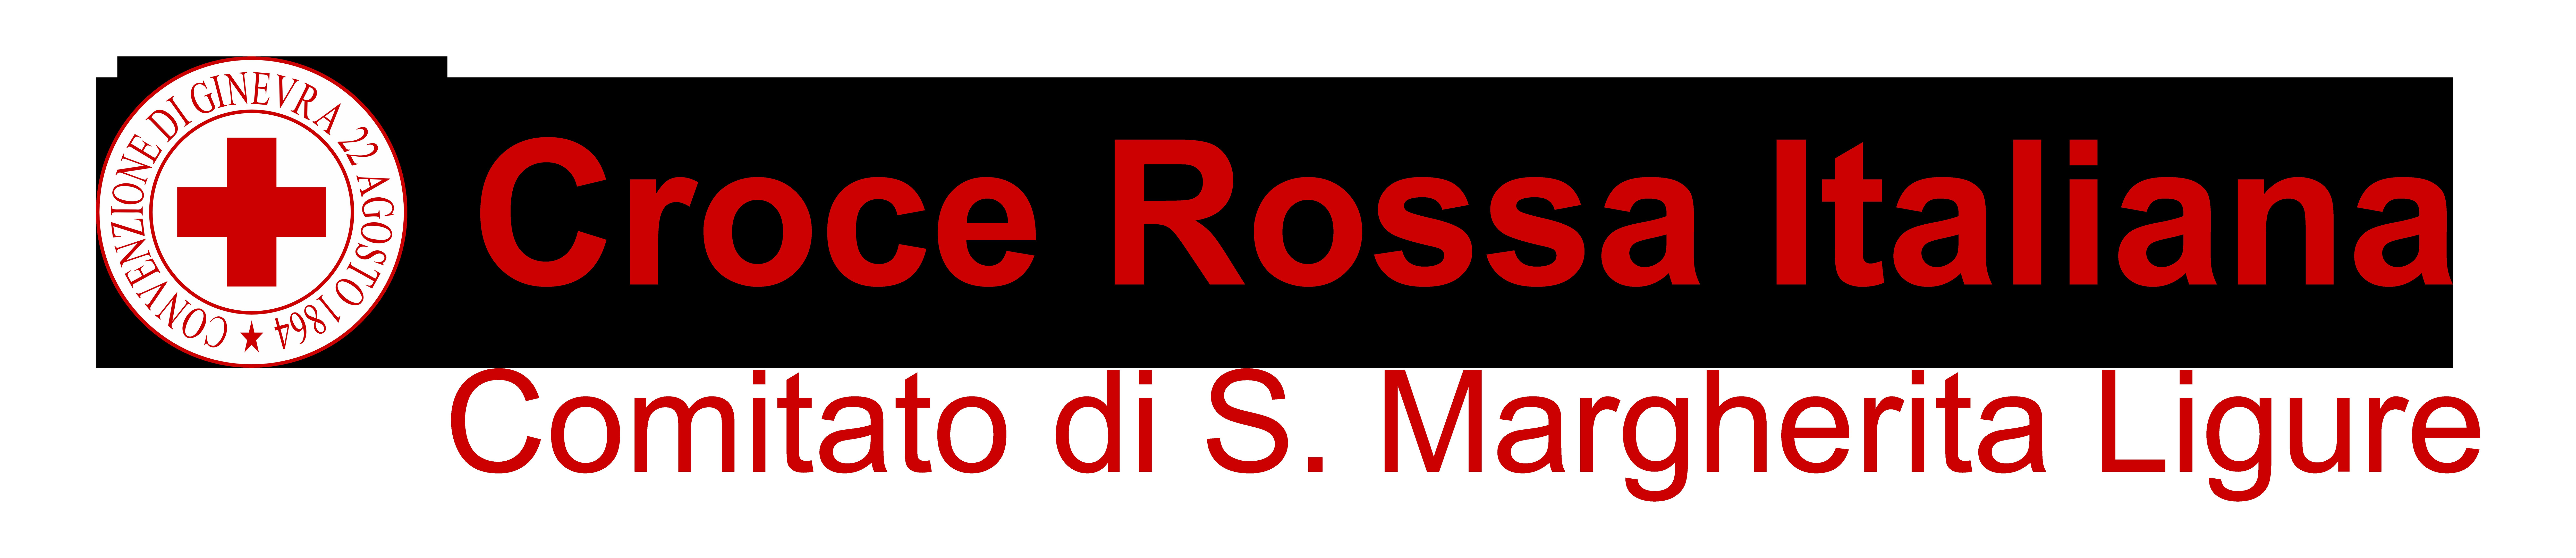 Comitato di Santa Margherita Ligure